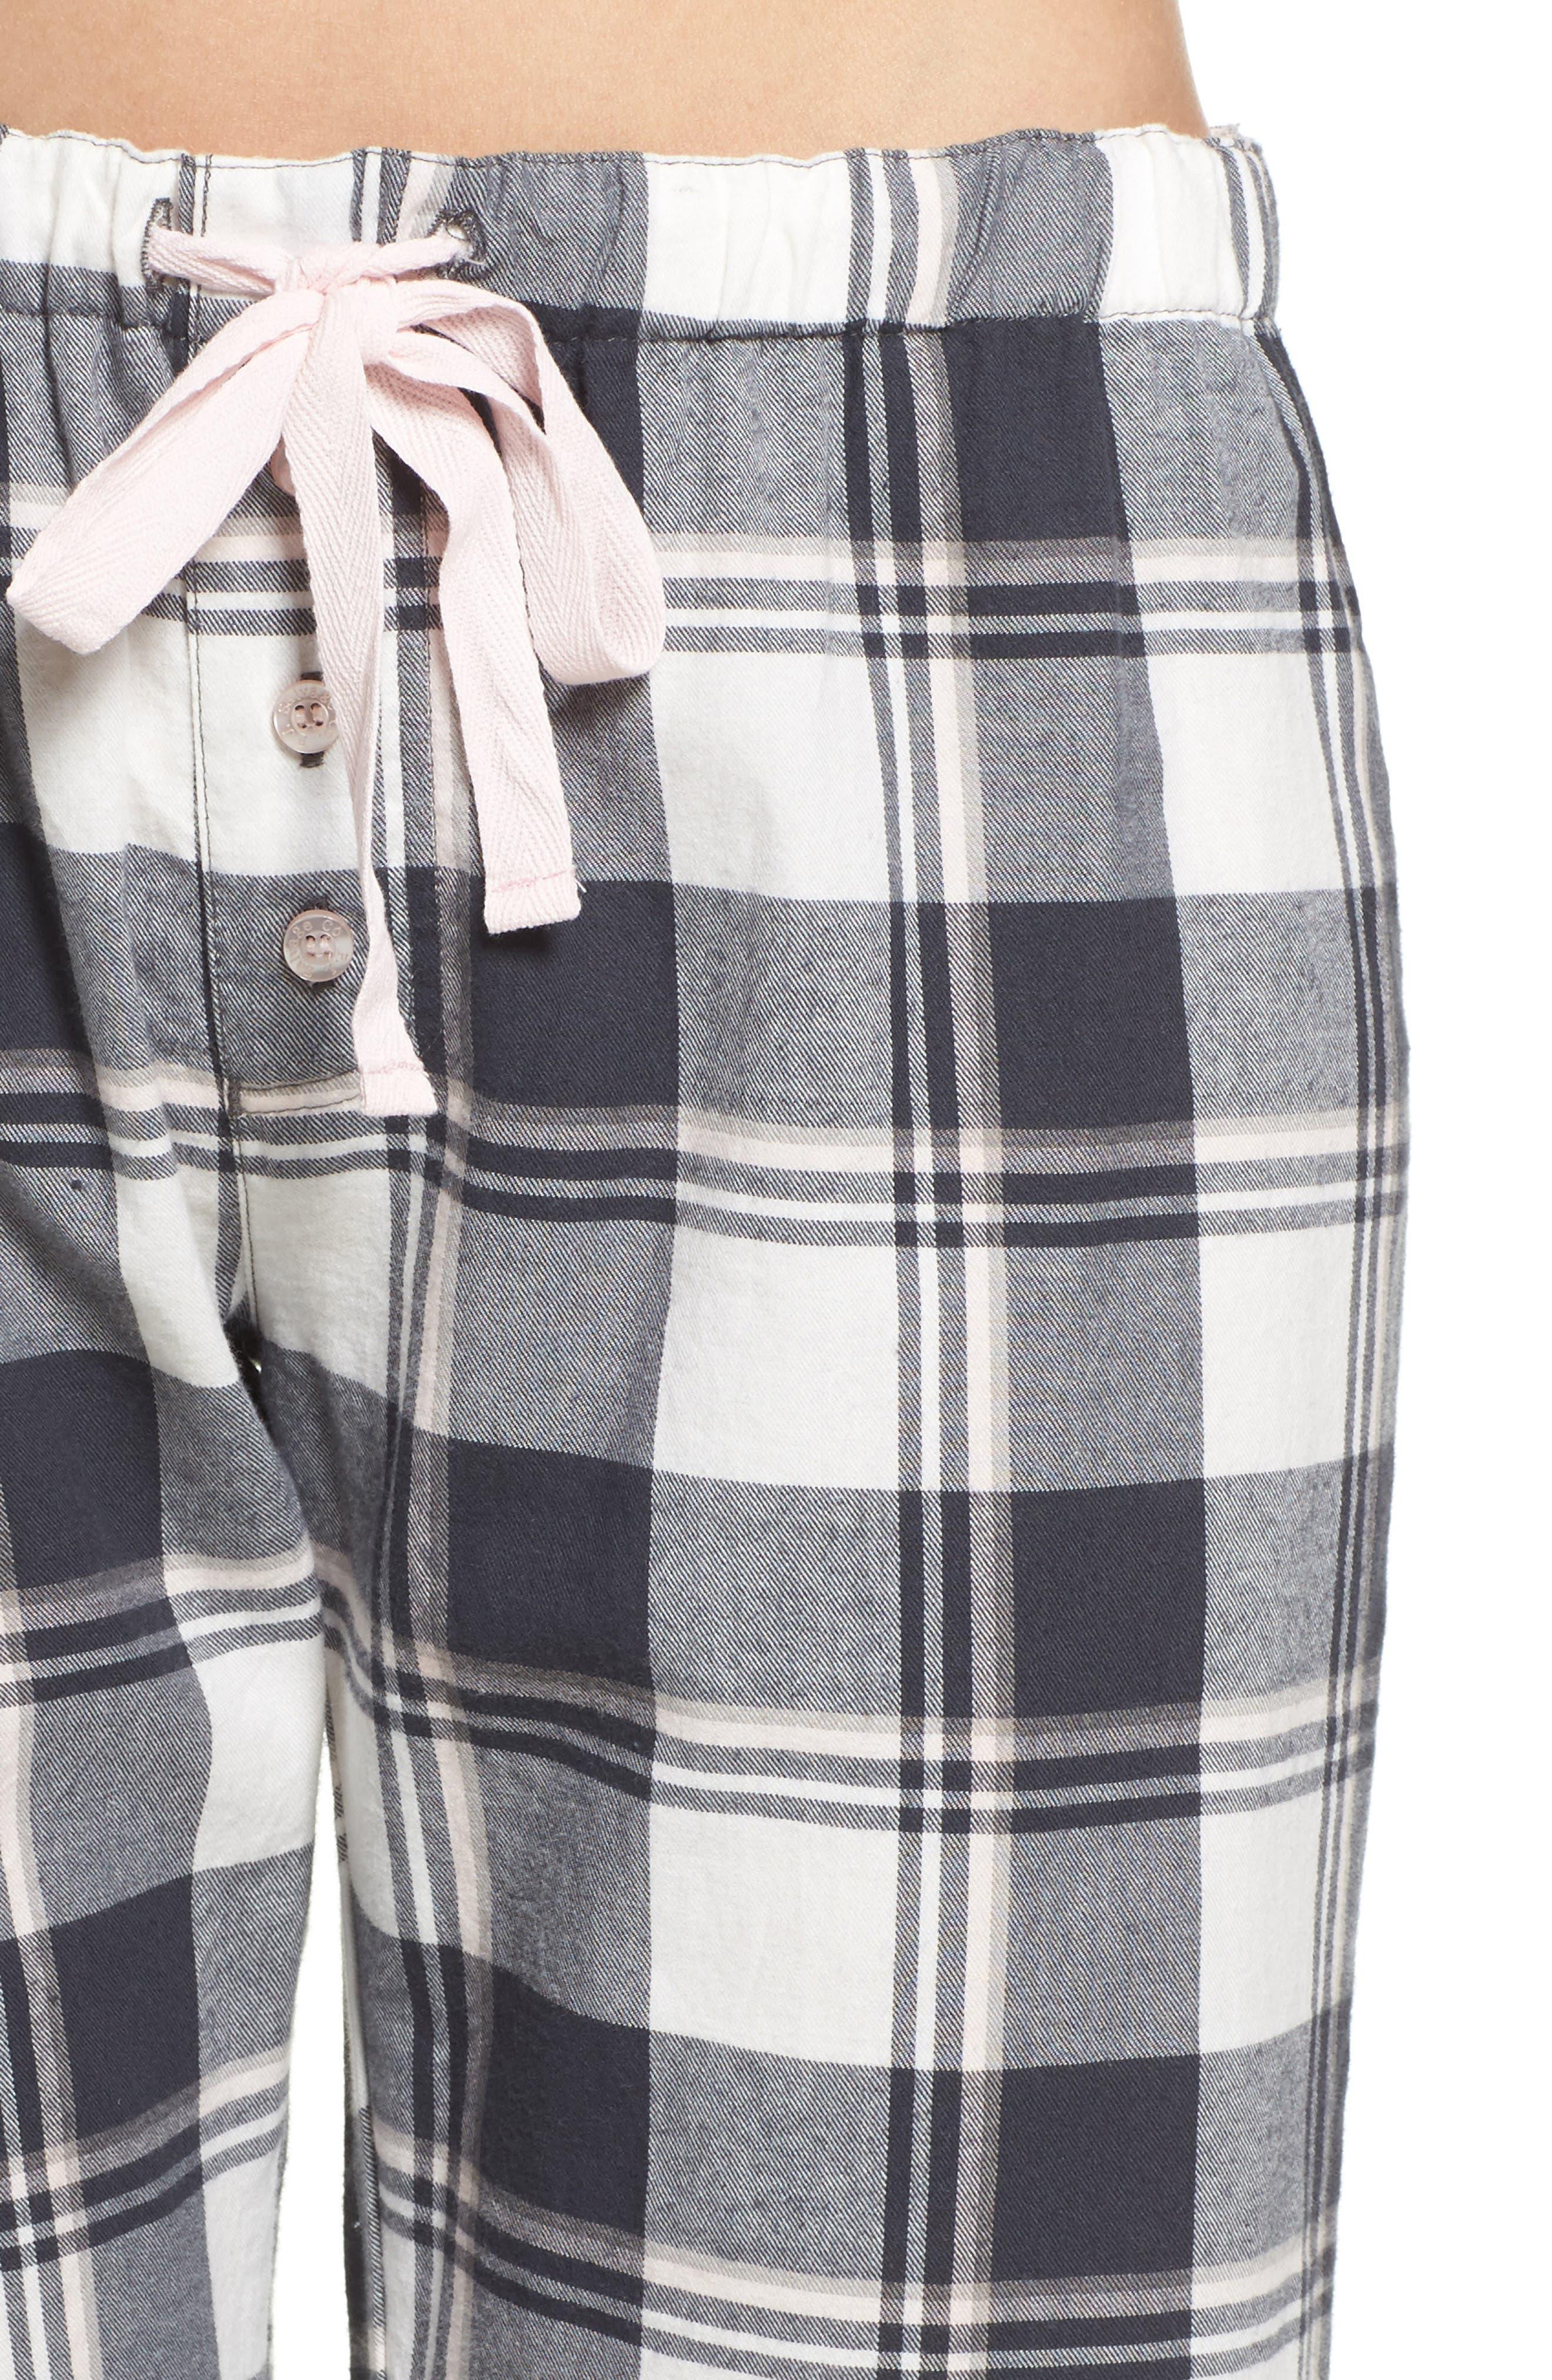 Plaid Pajama Pants,                             Alternate thumbnail 4, color,                             900